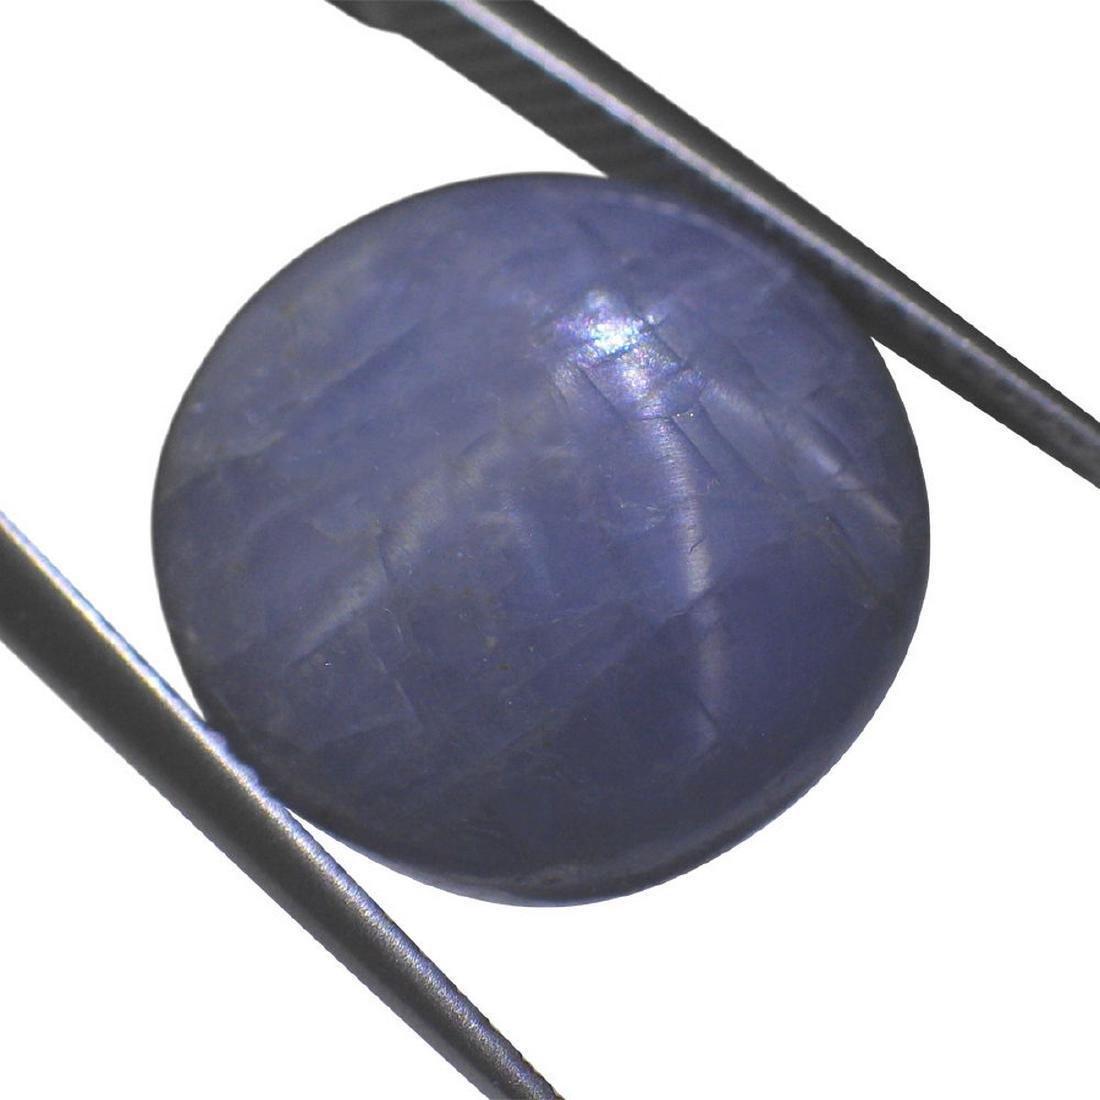 7.46 Carat Loose Round Star Sapphire - 6